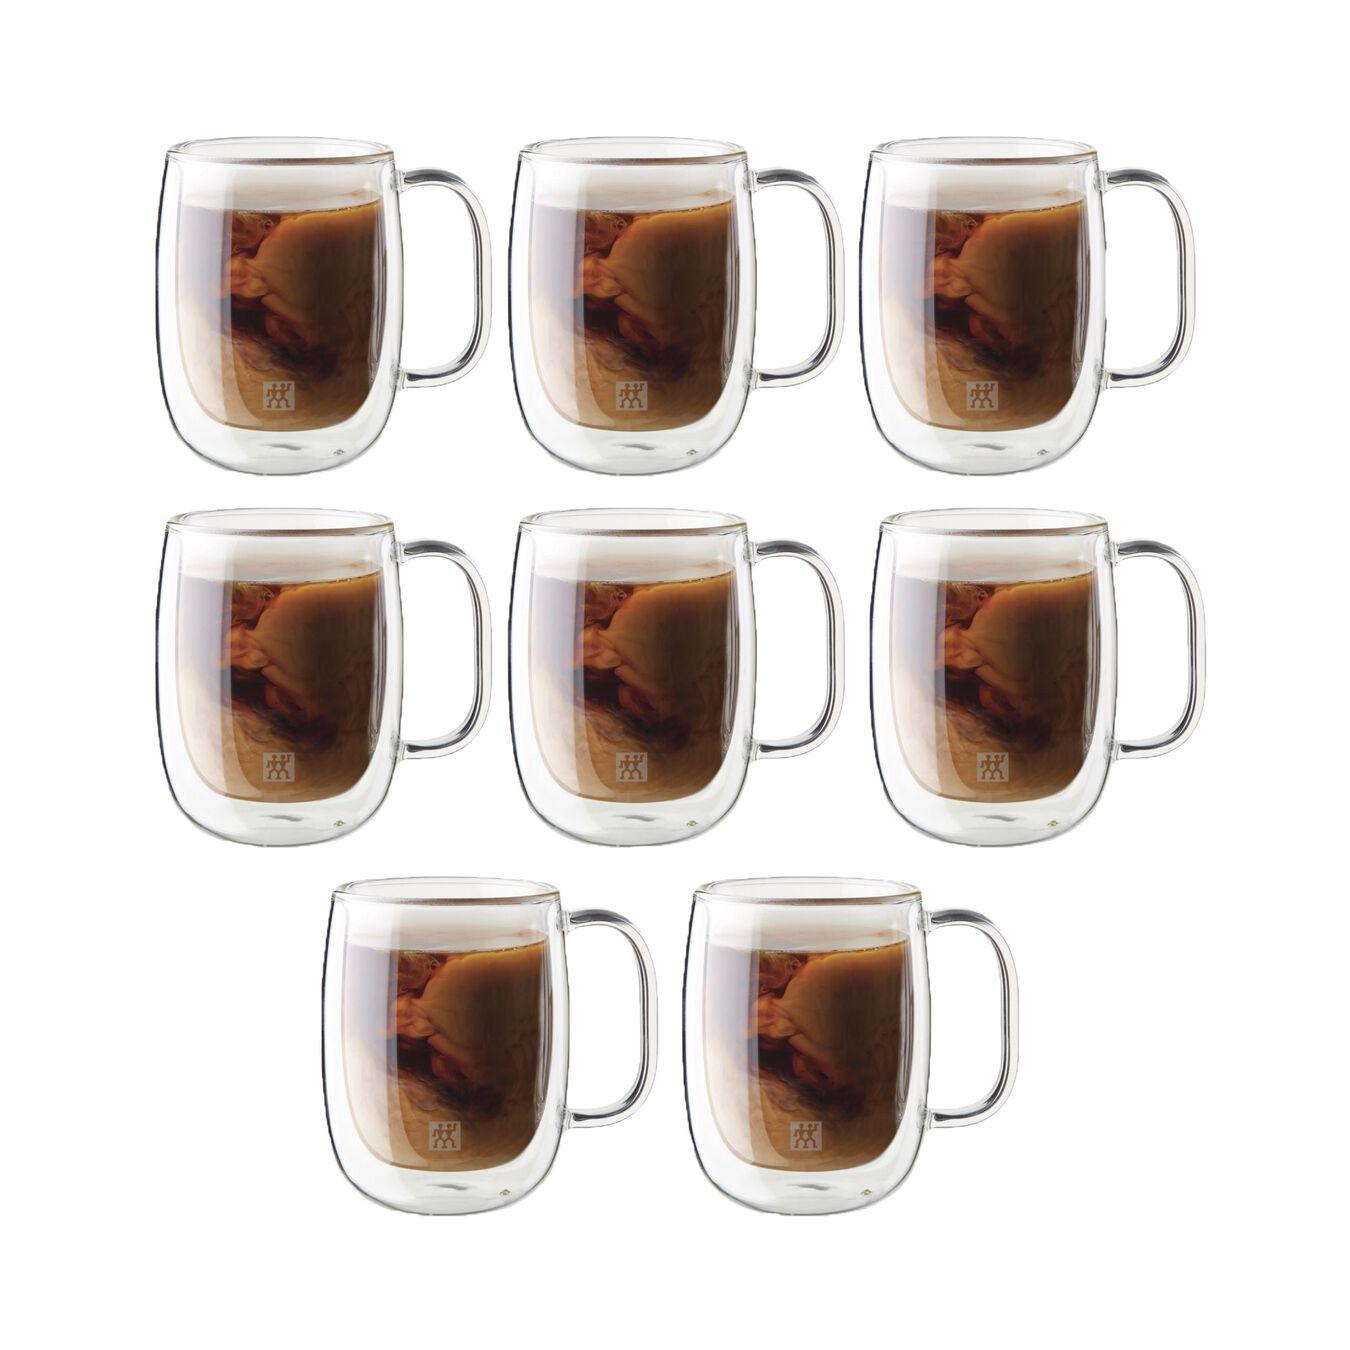 8 Piece Coffee Mug Set - Value Pack,,large 1